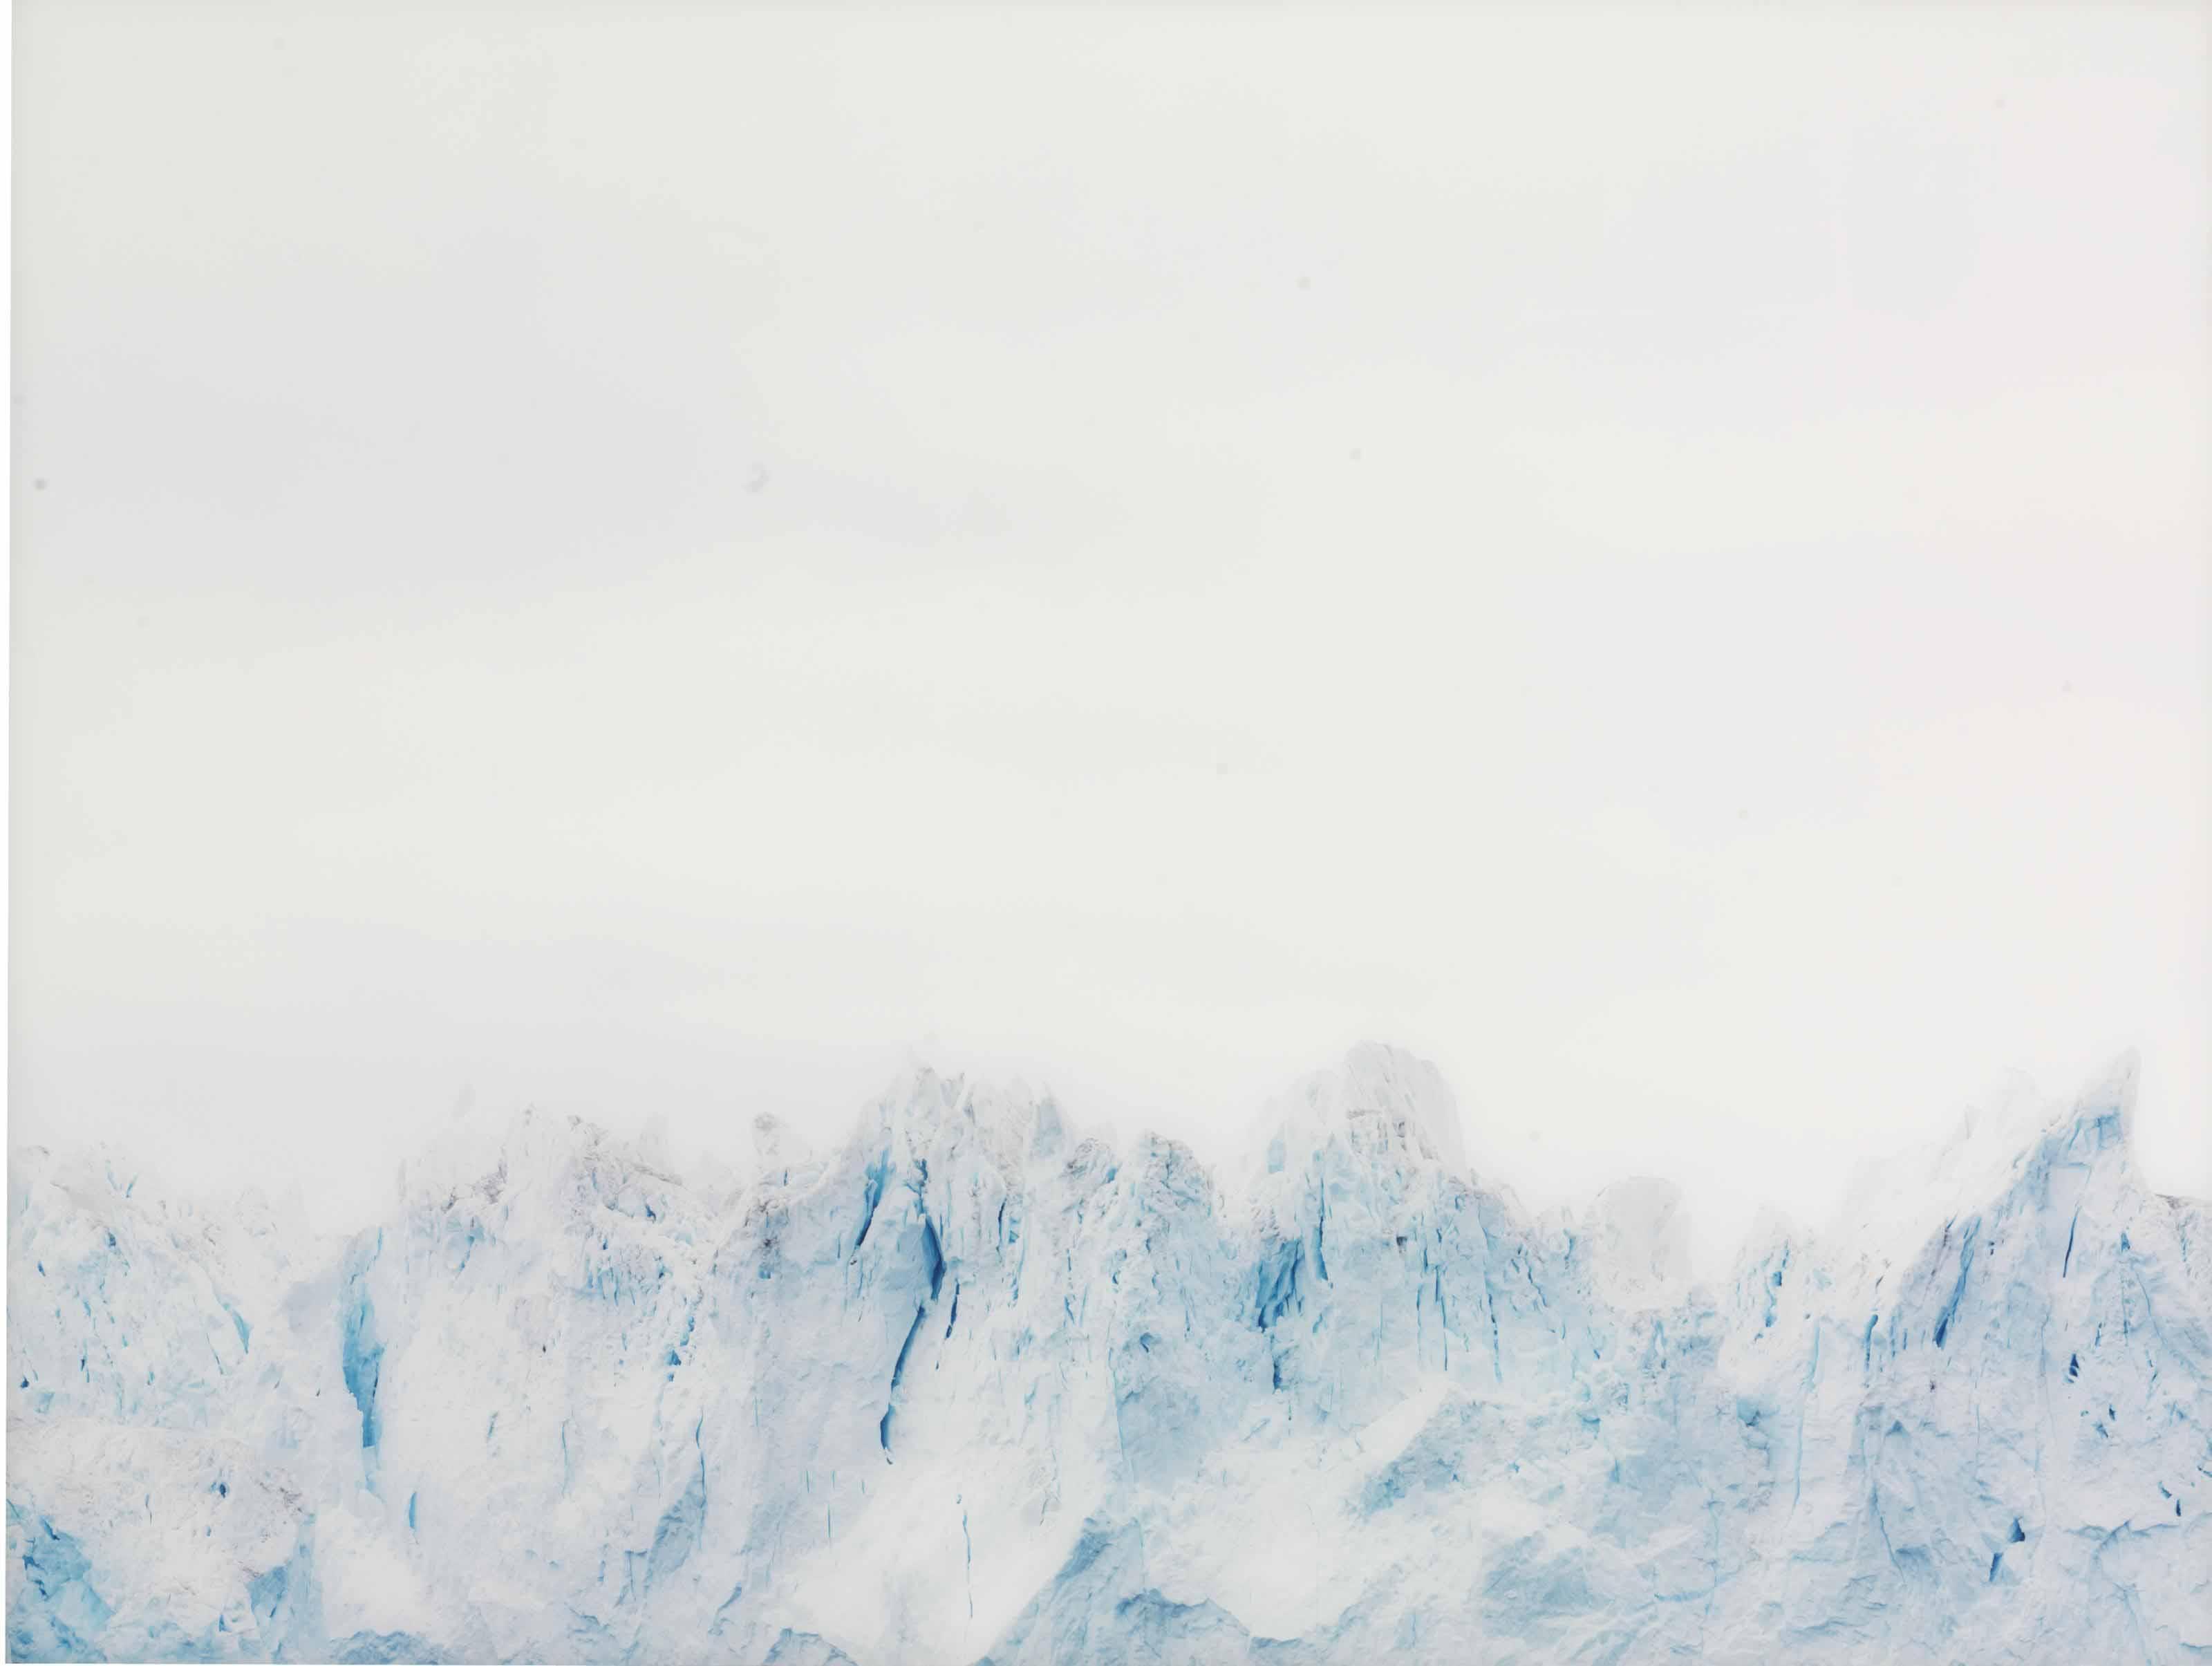 Greenland, 2003